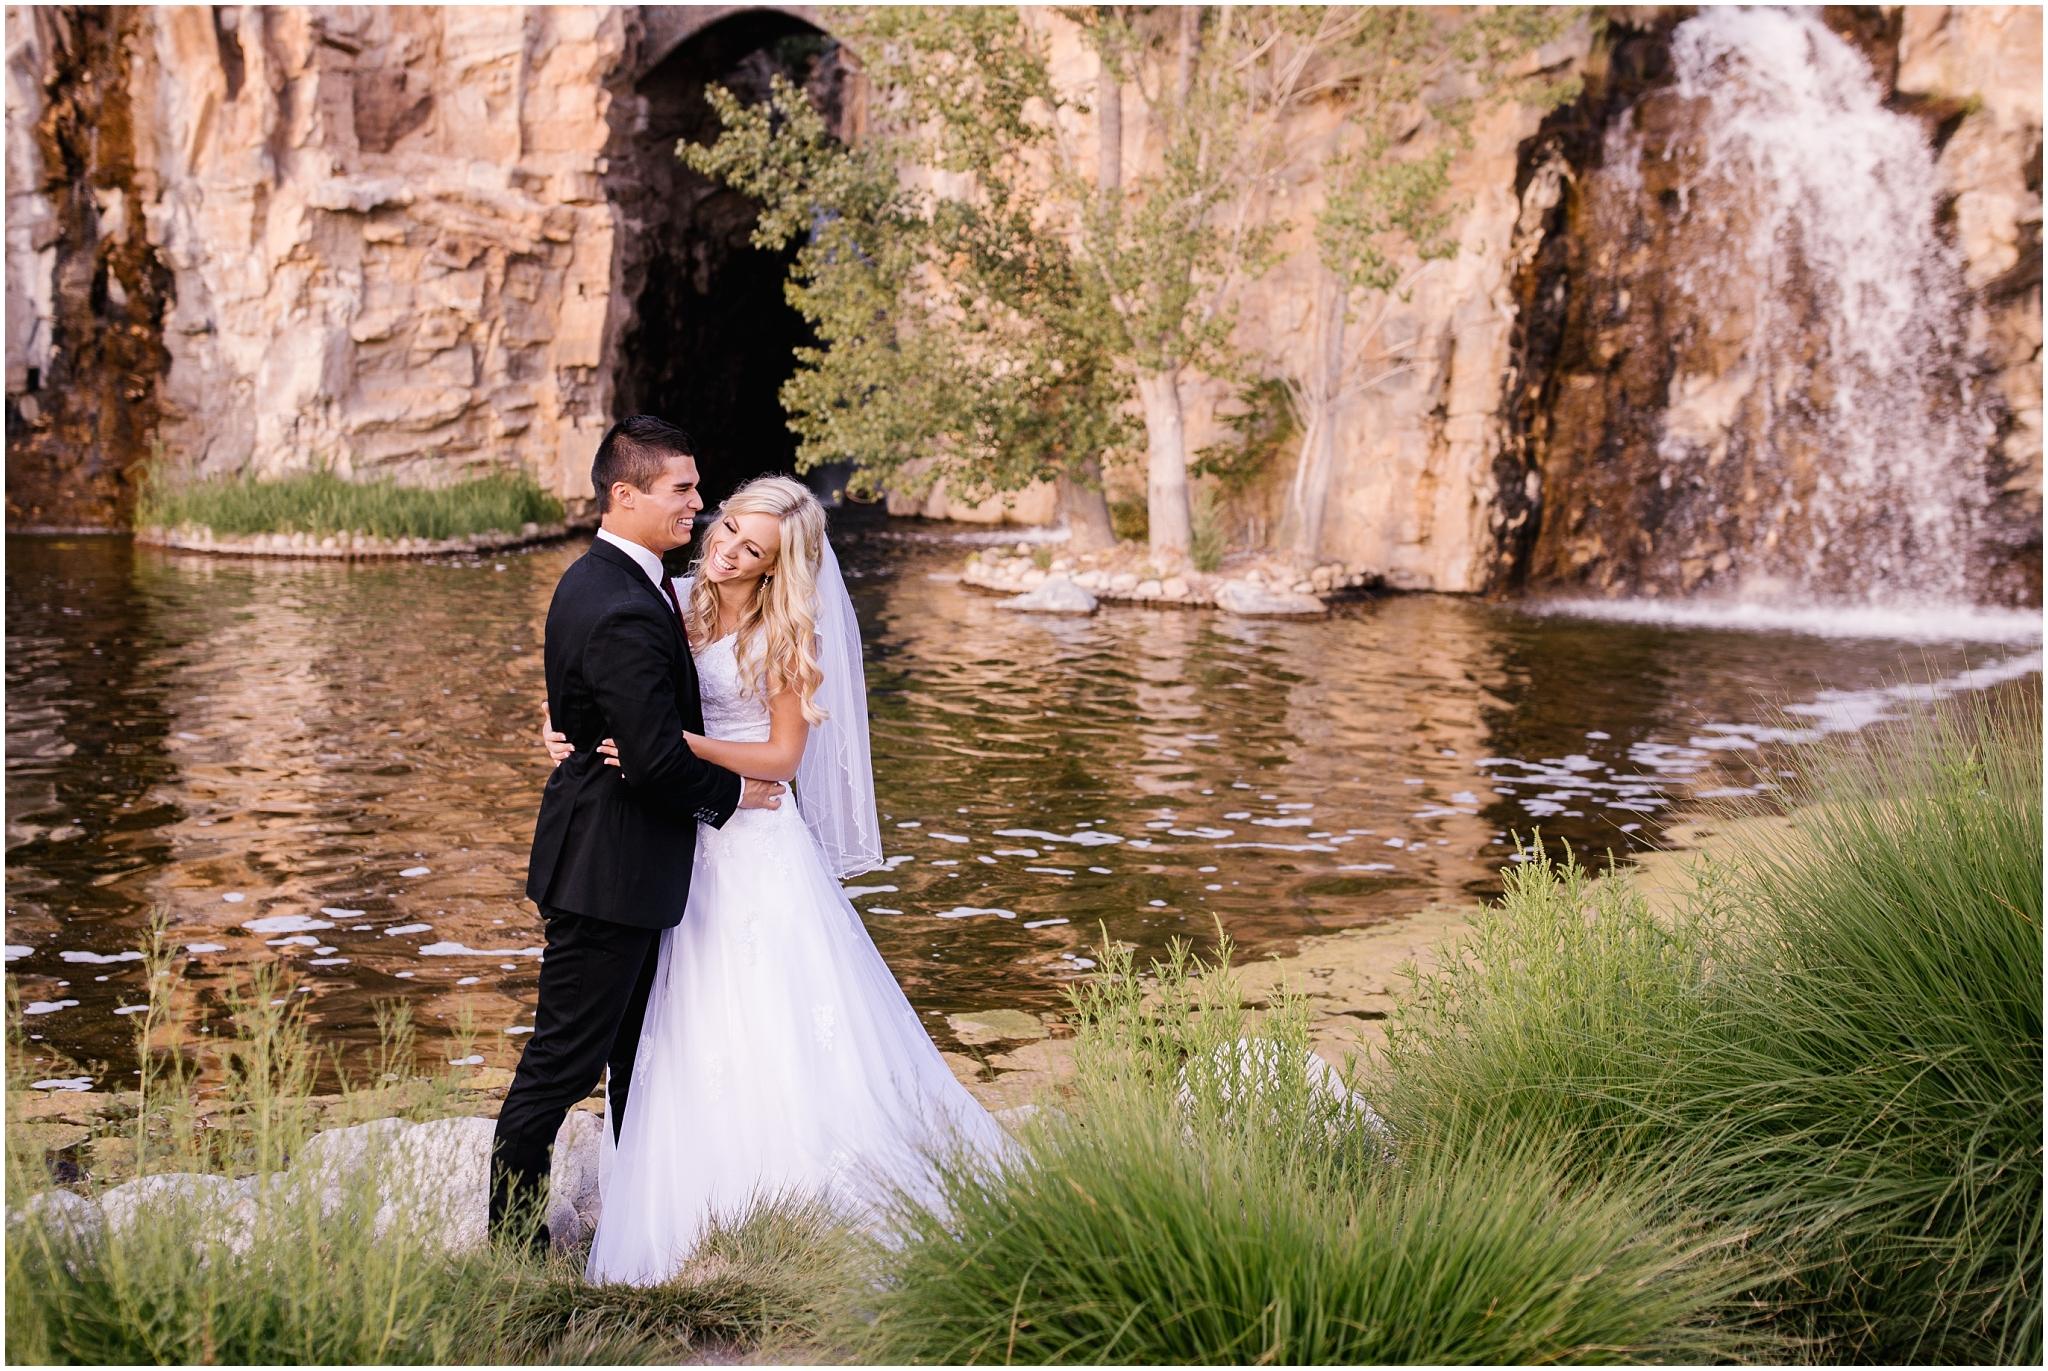 CHBridals-107_Lizzie-B-Imagery-Utah-Wedding-Photographer-Central-Utah-Park-City-Salt-Lake-City-Thanksgiving-Point-Bridals-Ashton-Gardens.jpg